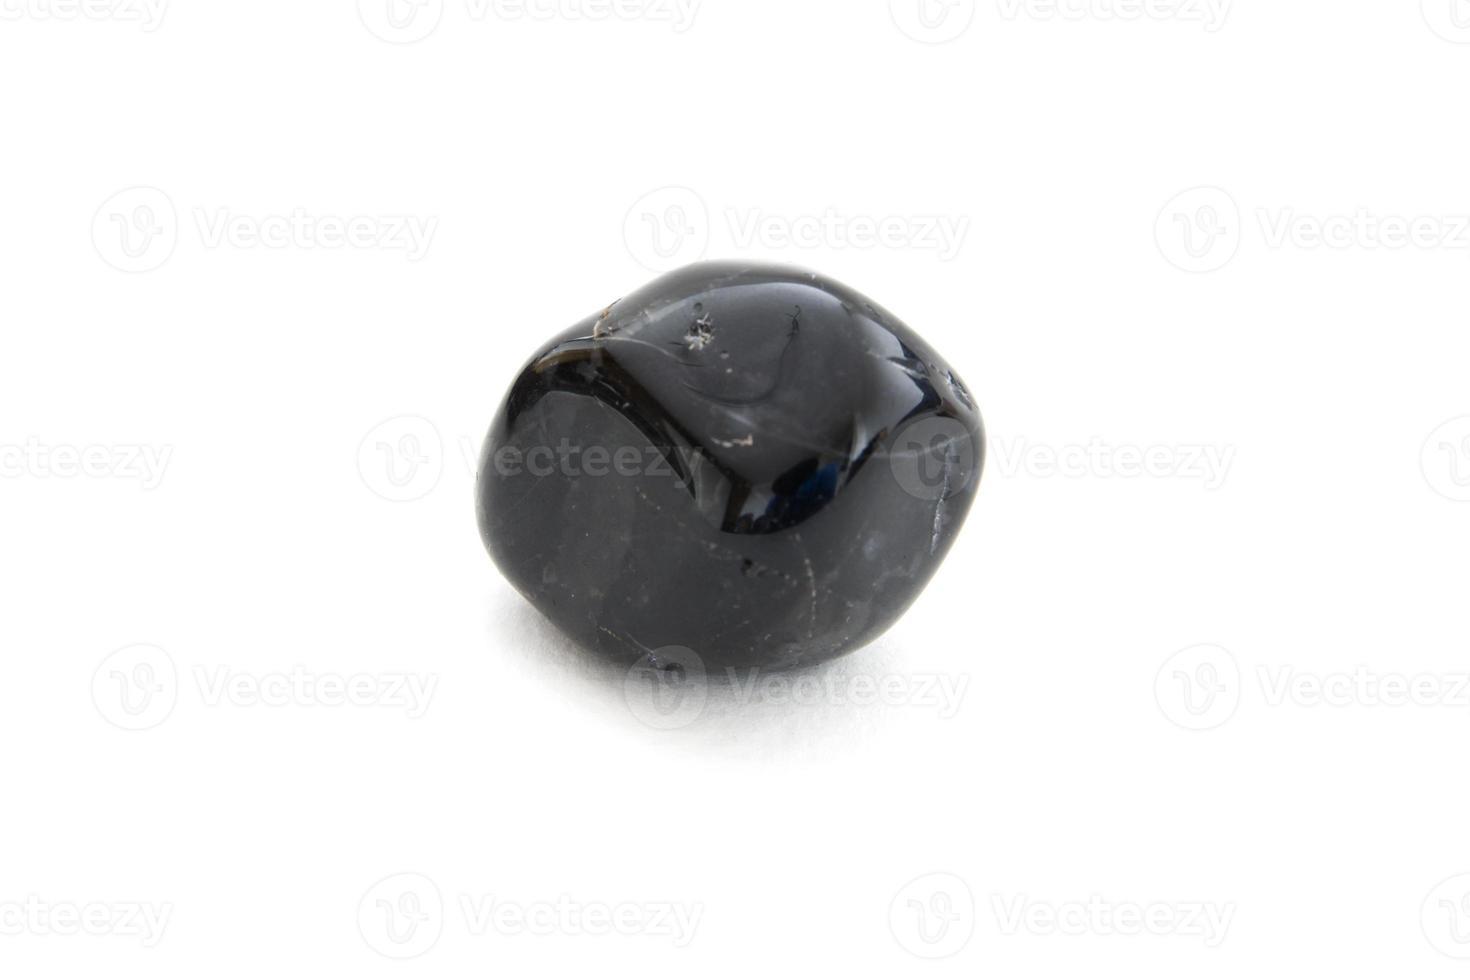 zwarte onyx mineraal op de witte achtergrond foto